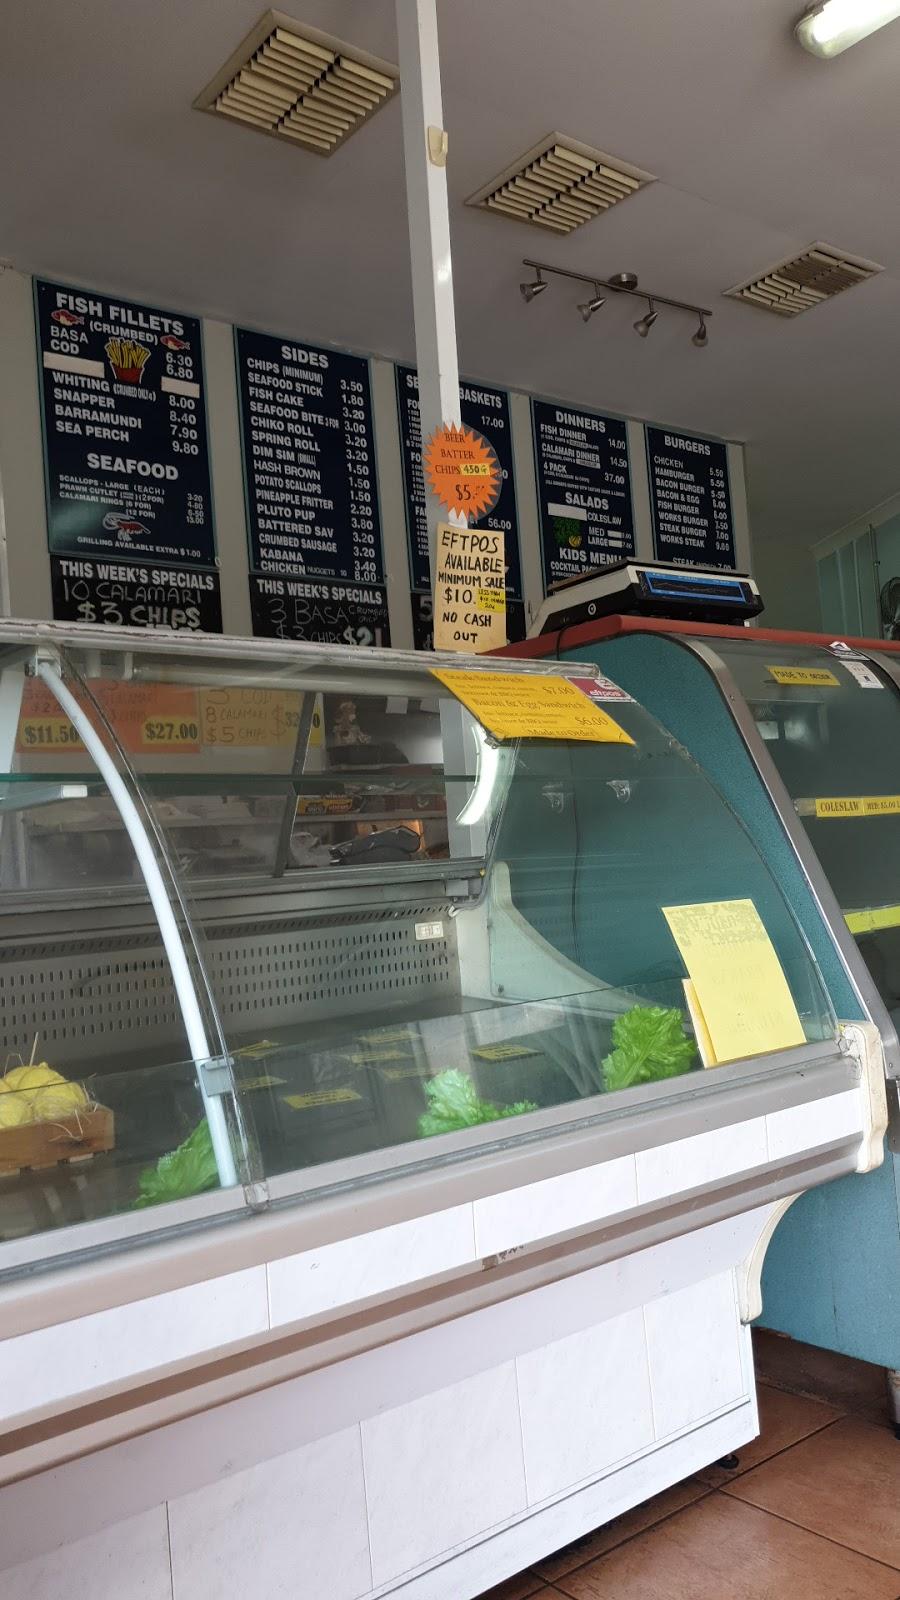 Riverhills Seafood | restaurant | 1/200 Sumners Rd, Riverhills QLD 4074, Australia | 0737156144 OR +61 7 3715 6144